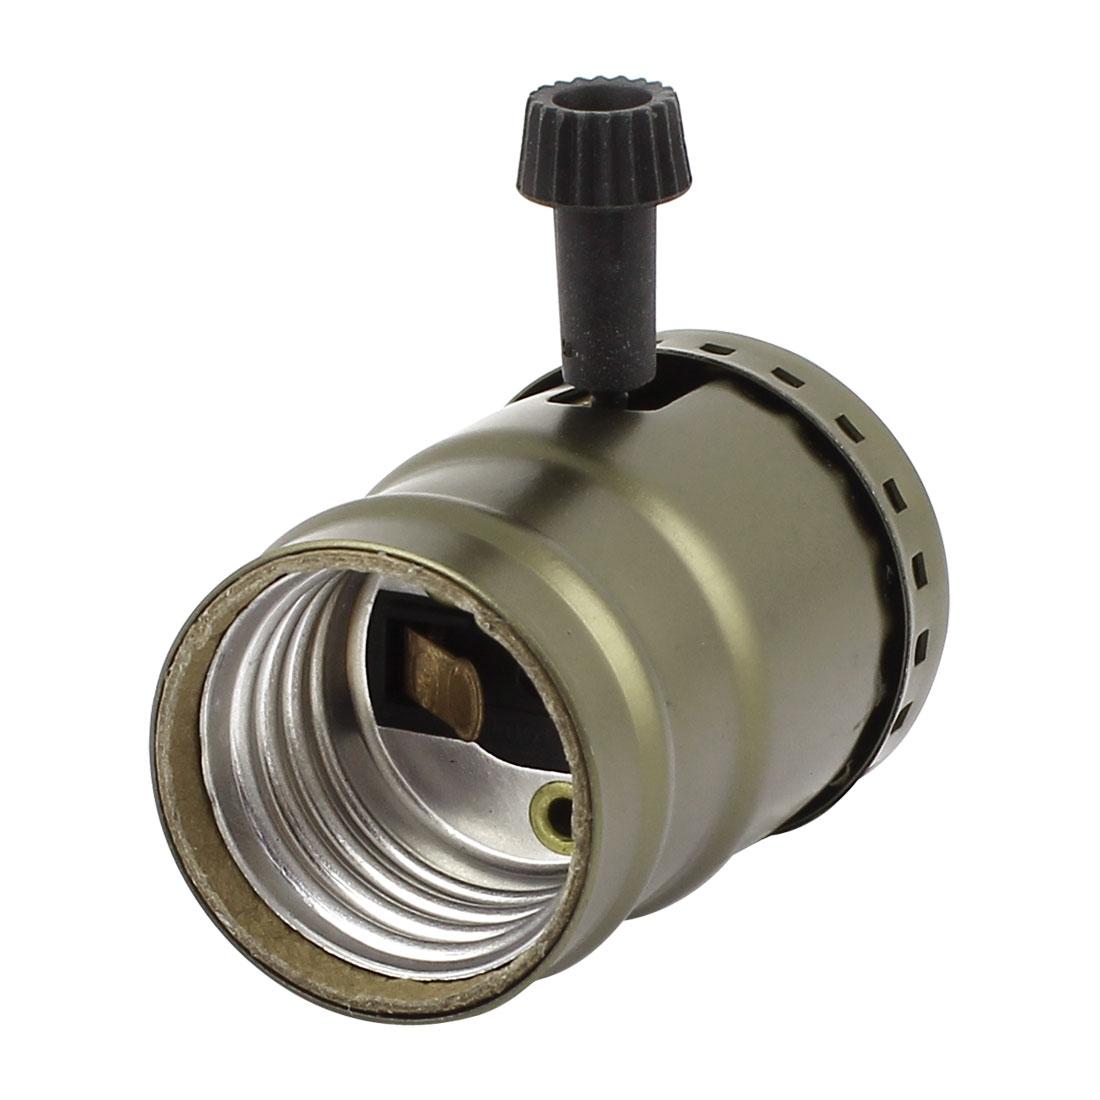 E26 E27 Bulb Base Holders Screw Rotary Switch Lamp Socket Adapter Bronze Tone